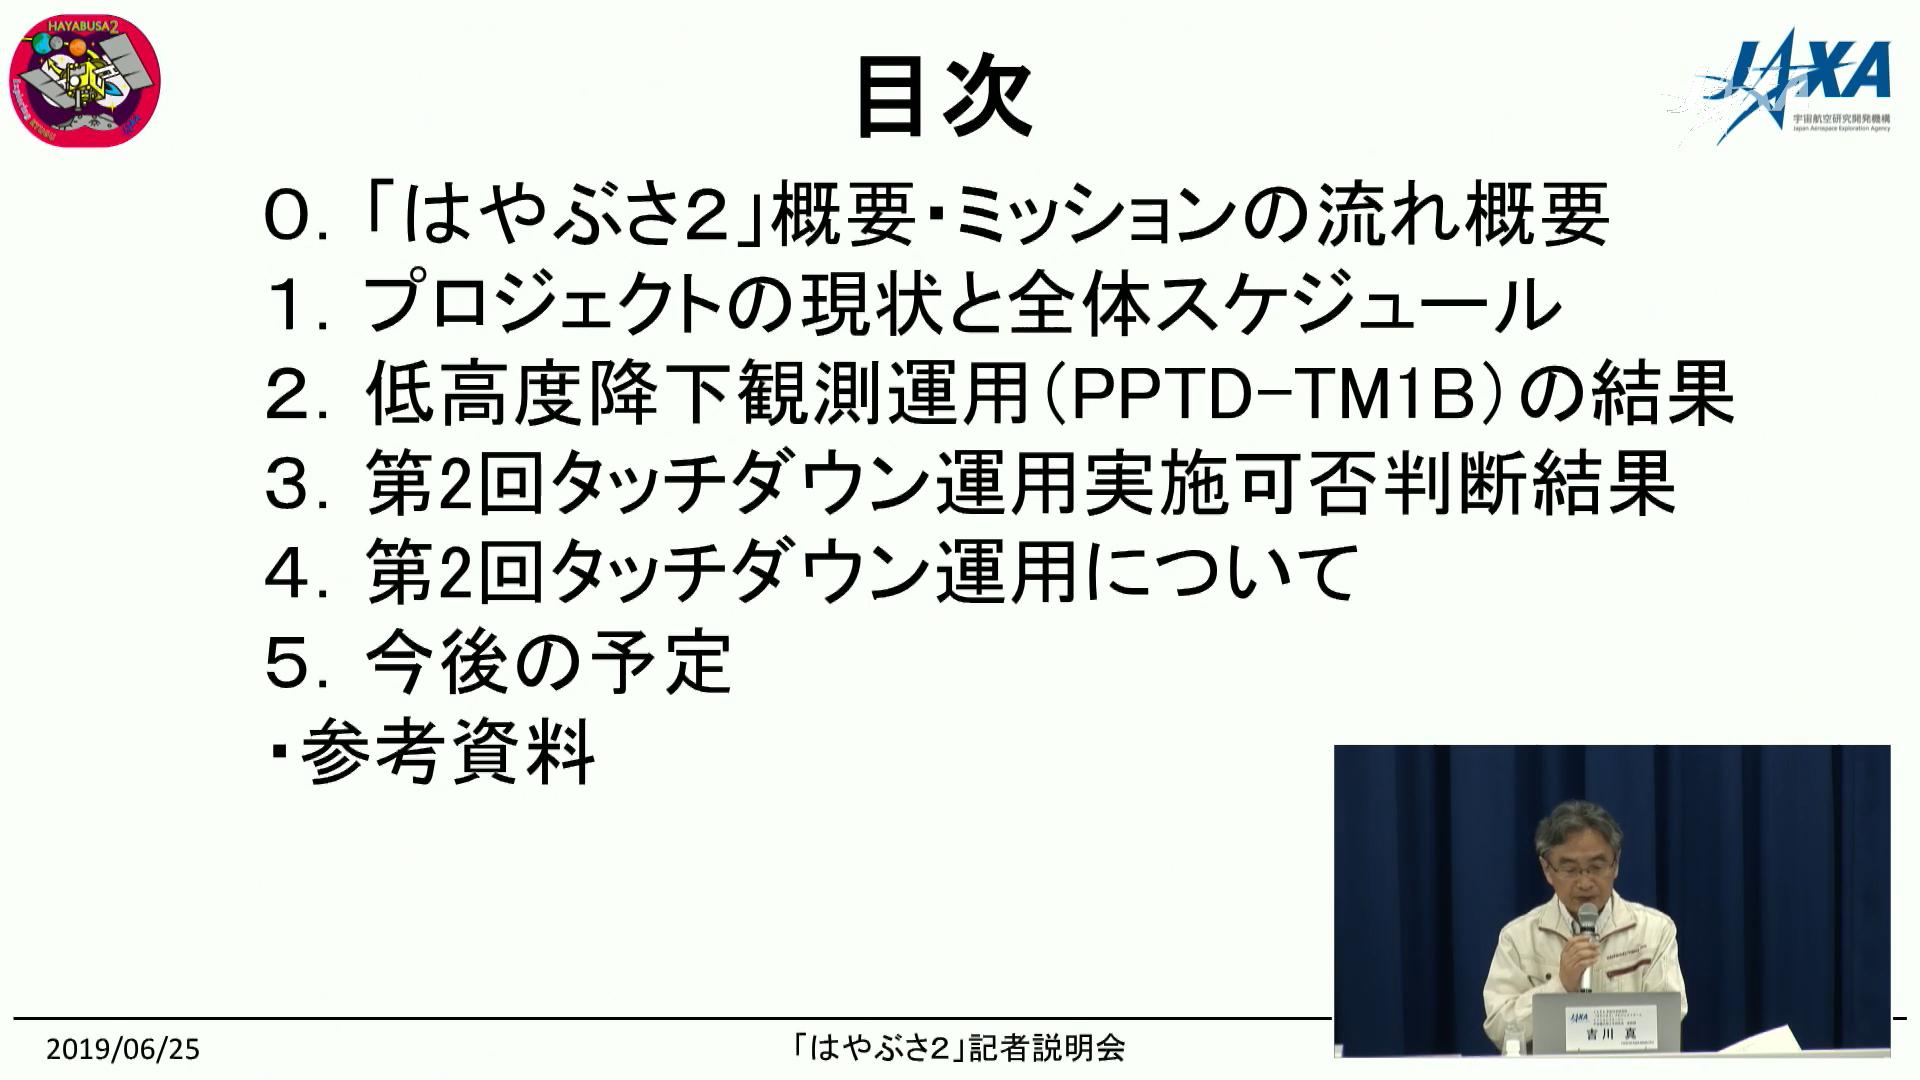 f:id:Imamura:20190625234636p:plain